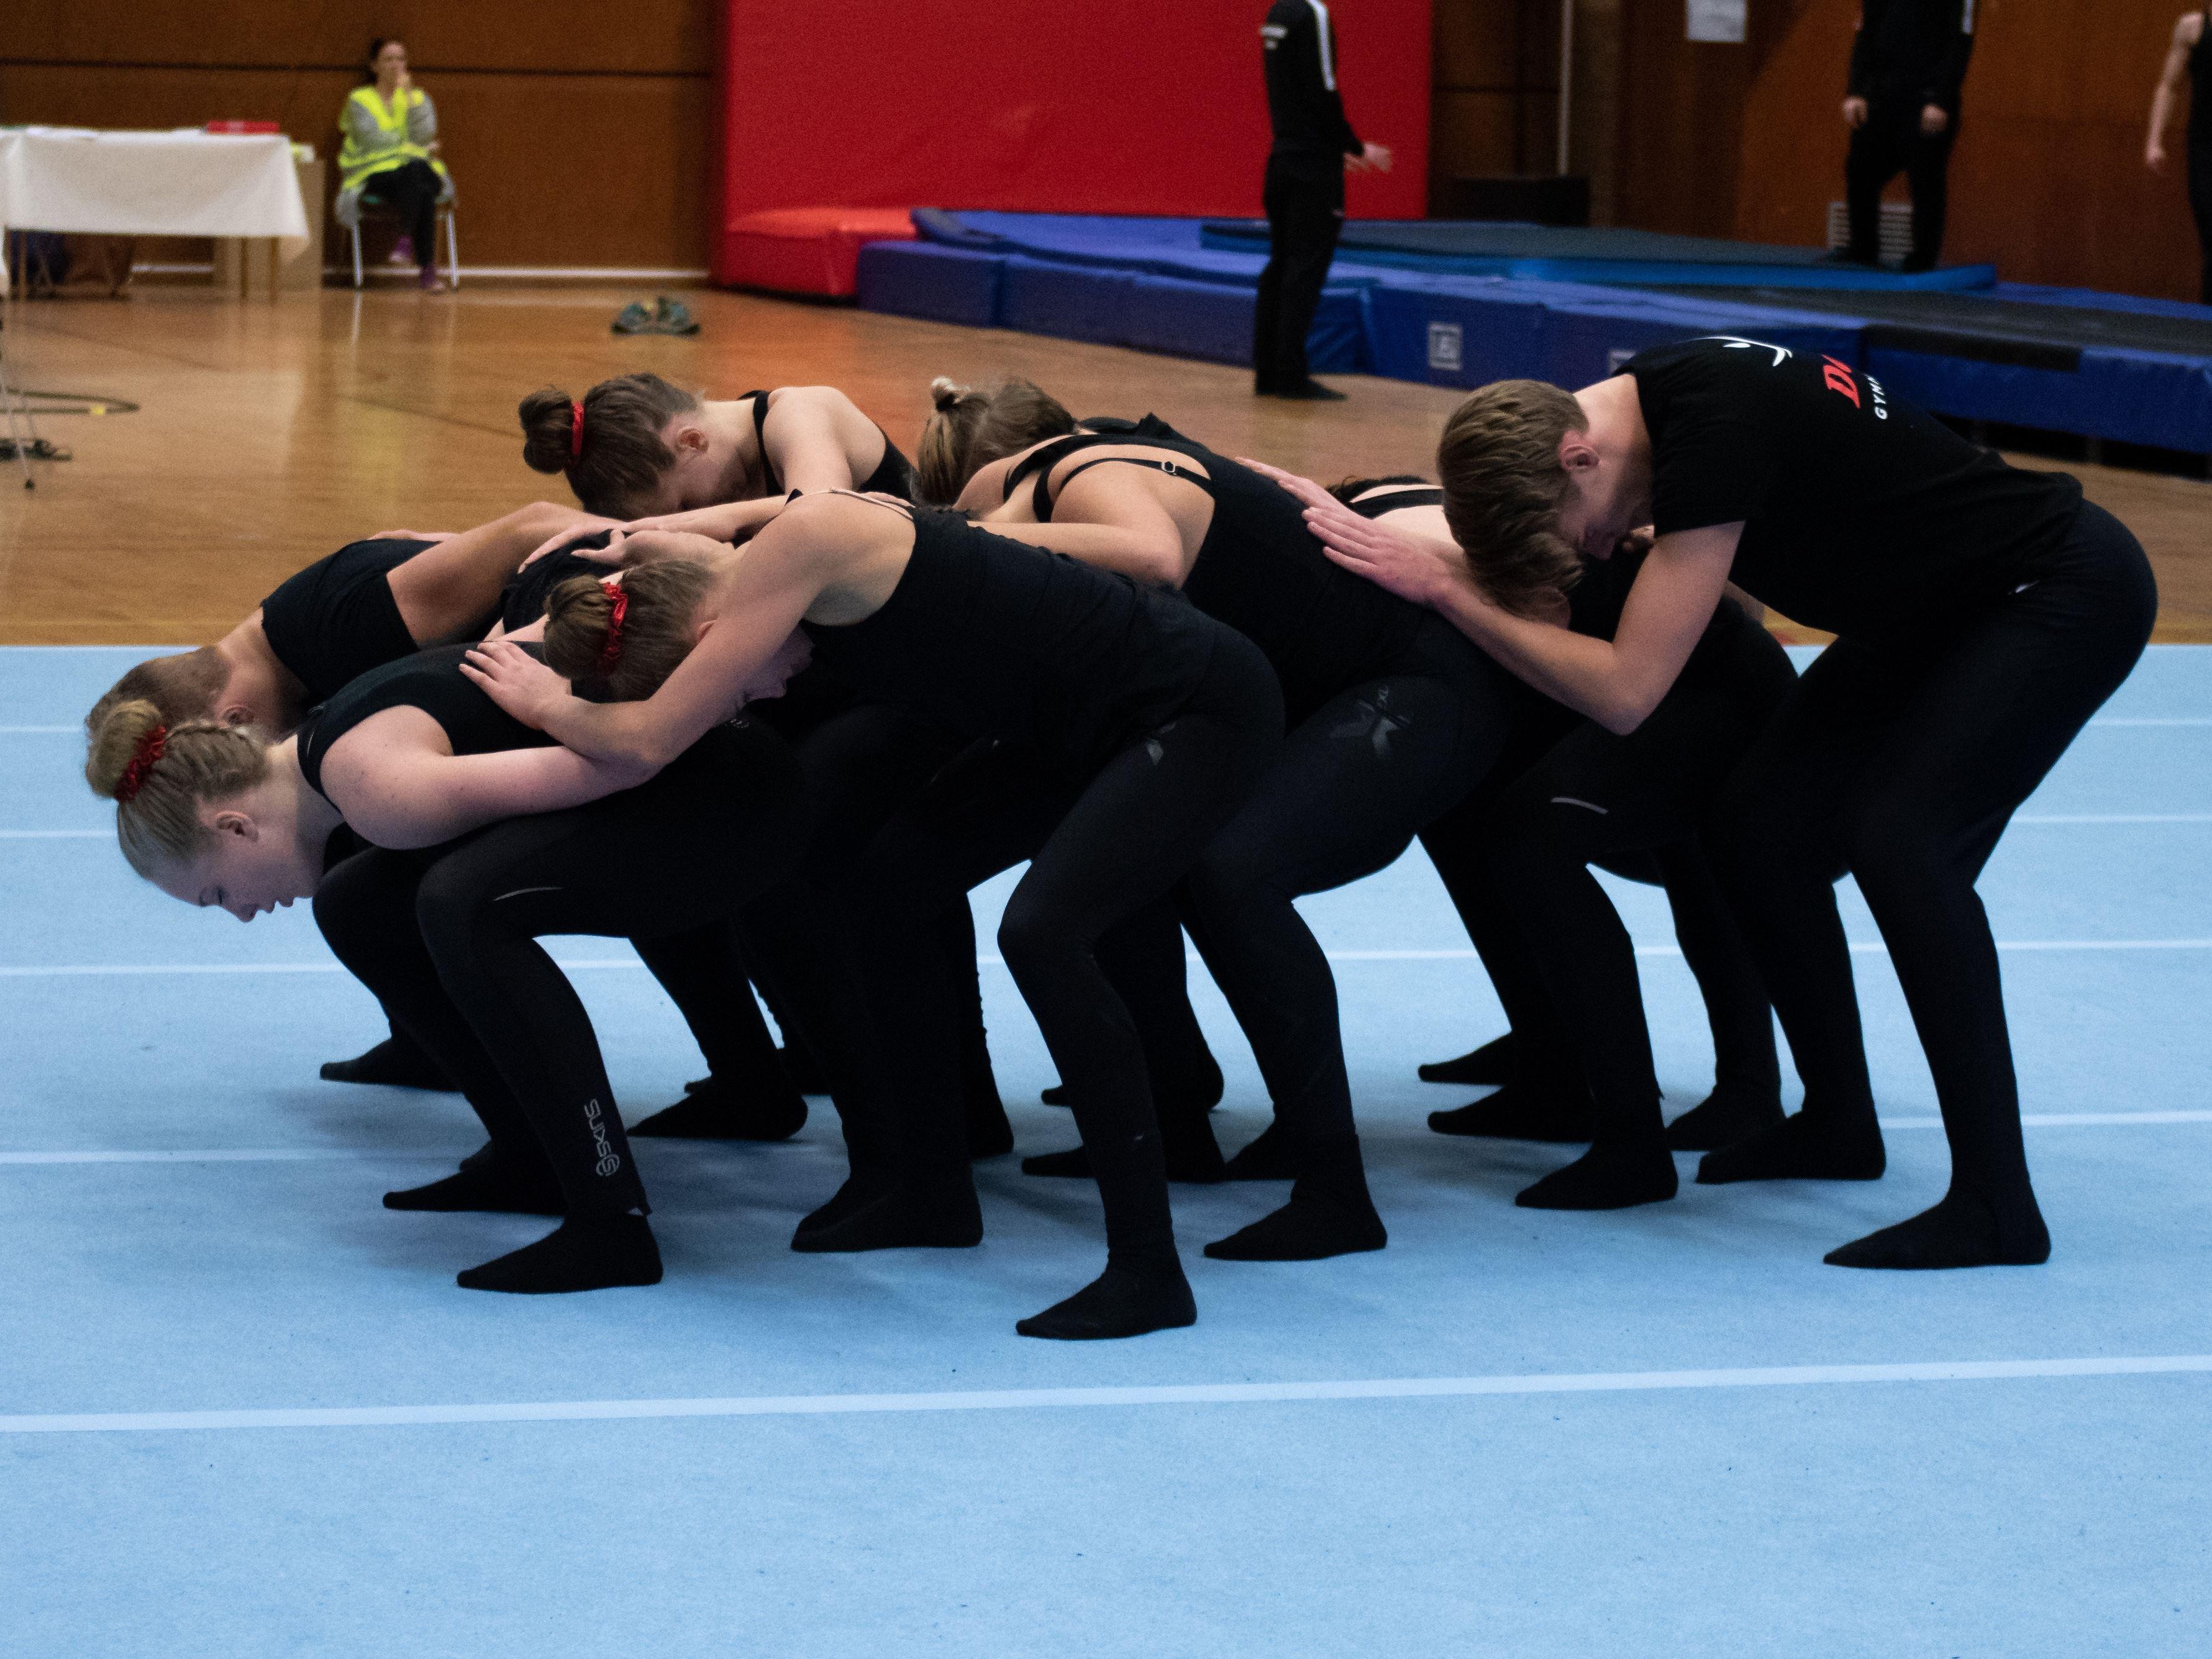 Idrott: USM i truppgymnastik